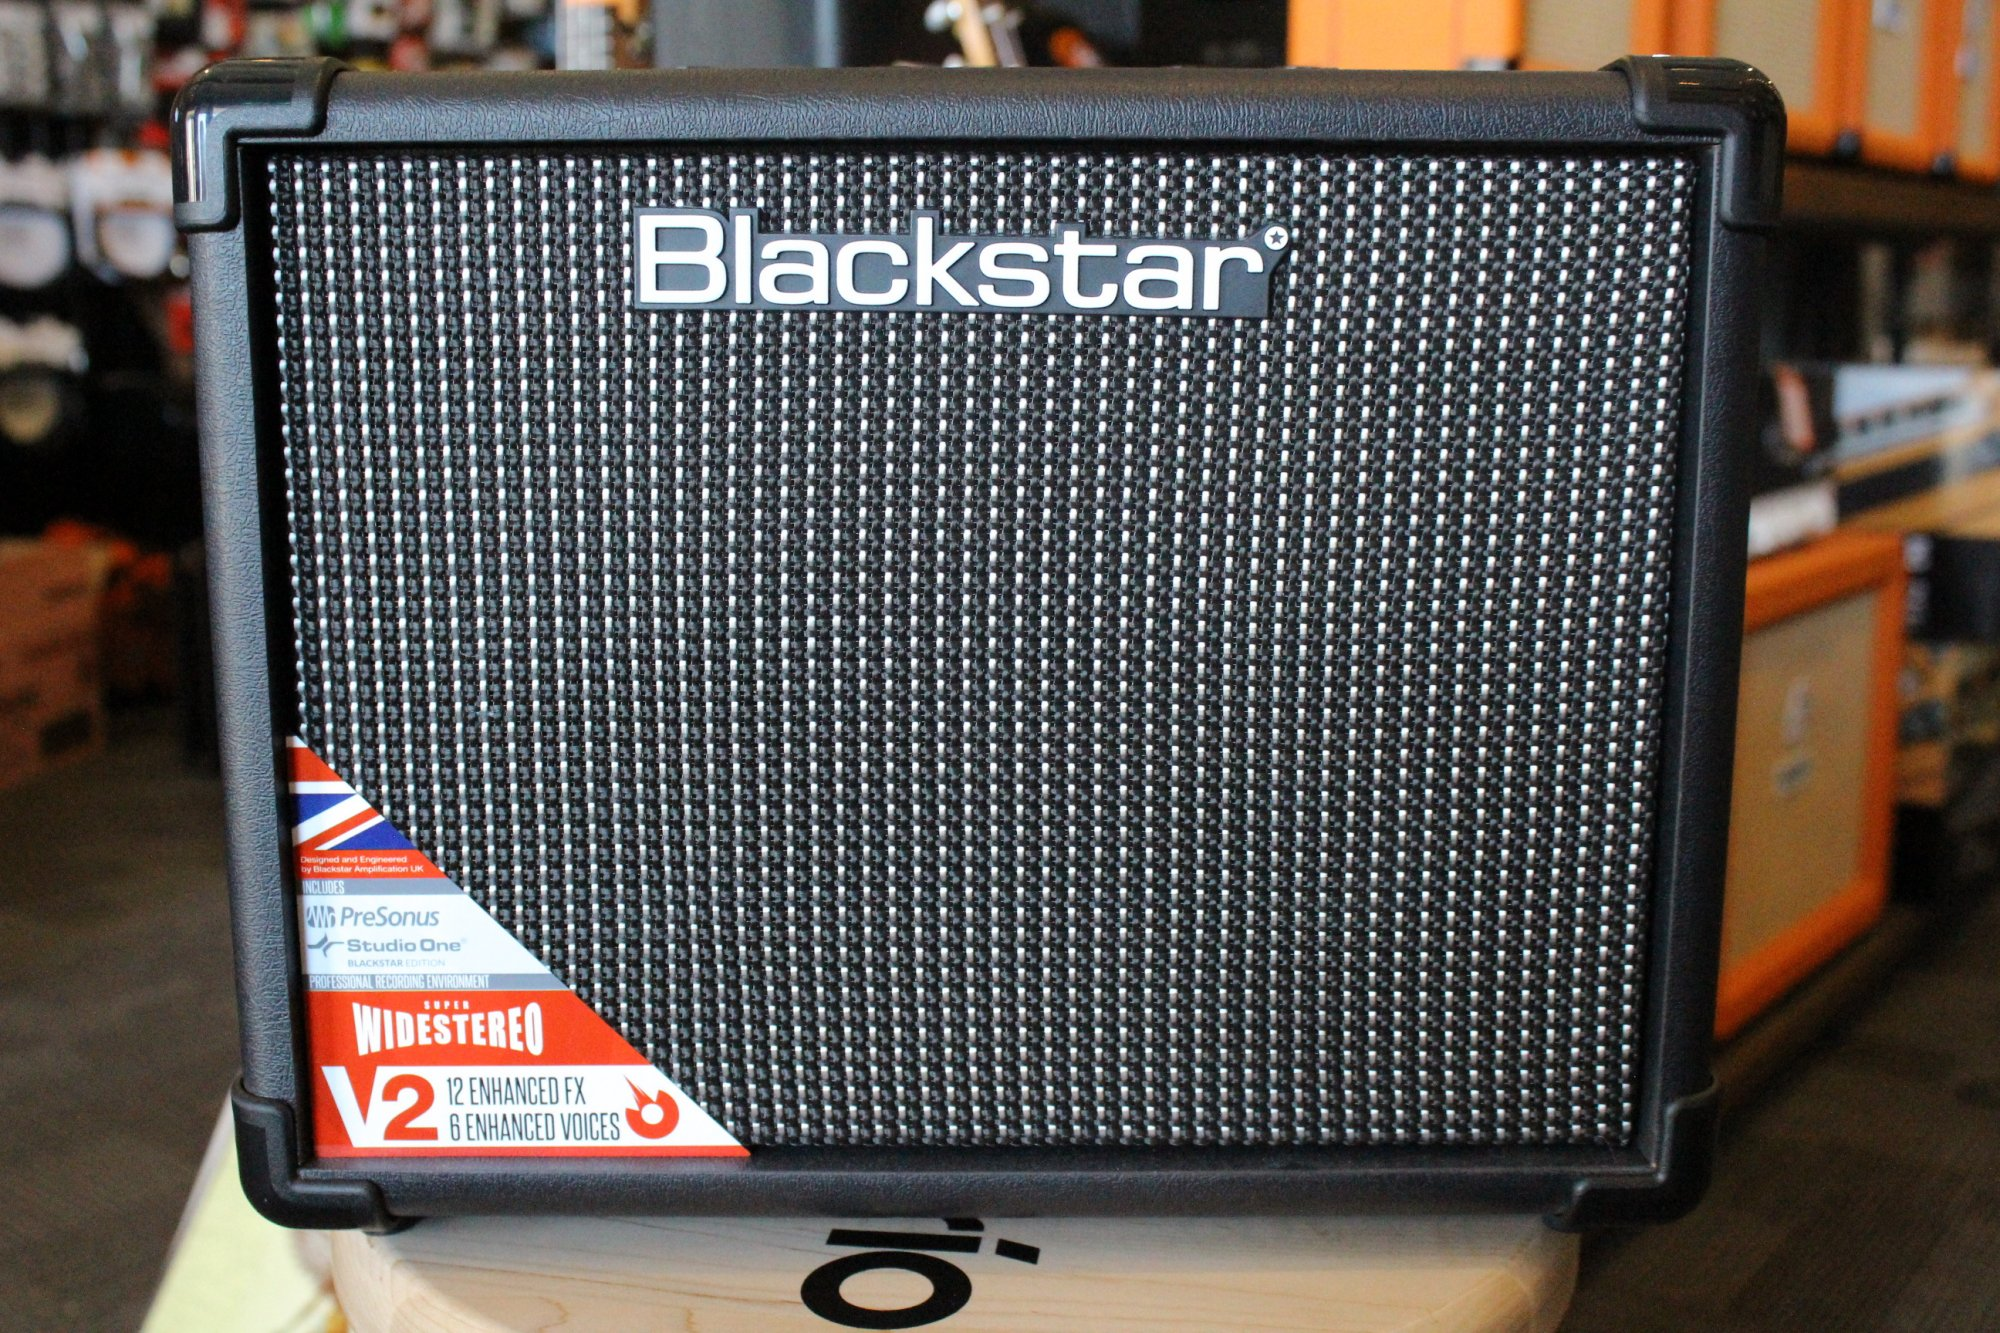 Blackstar Idcore10v2 10w Digital Stereo Combo Simple Audio Amplifier